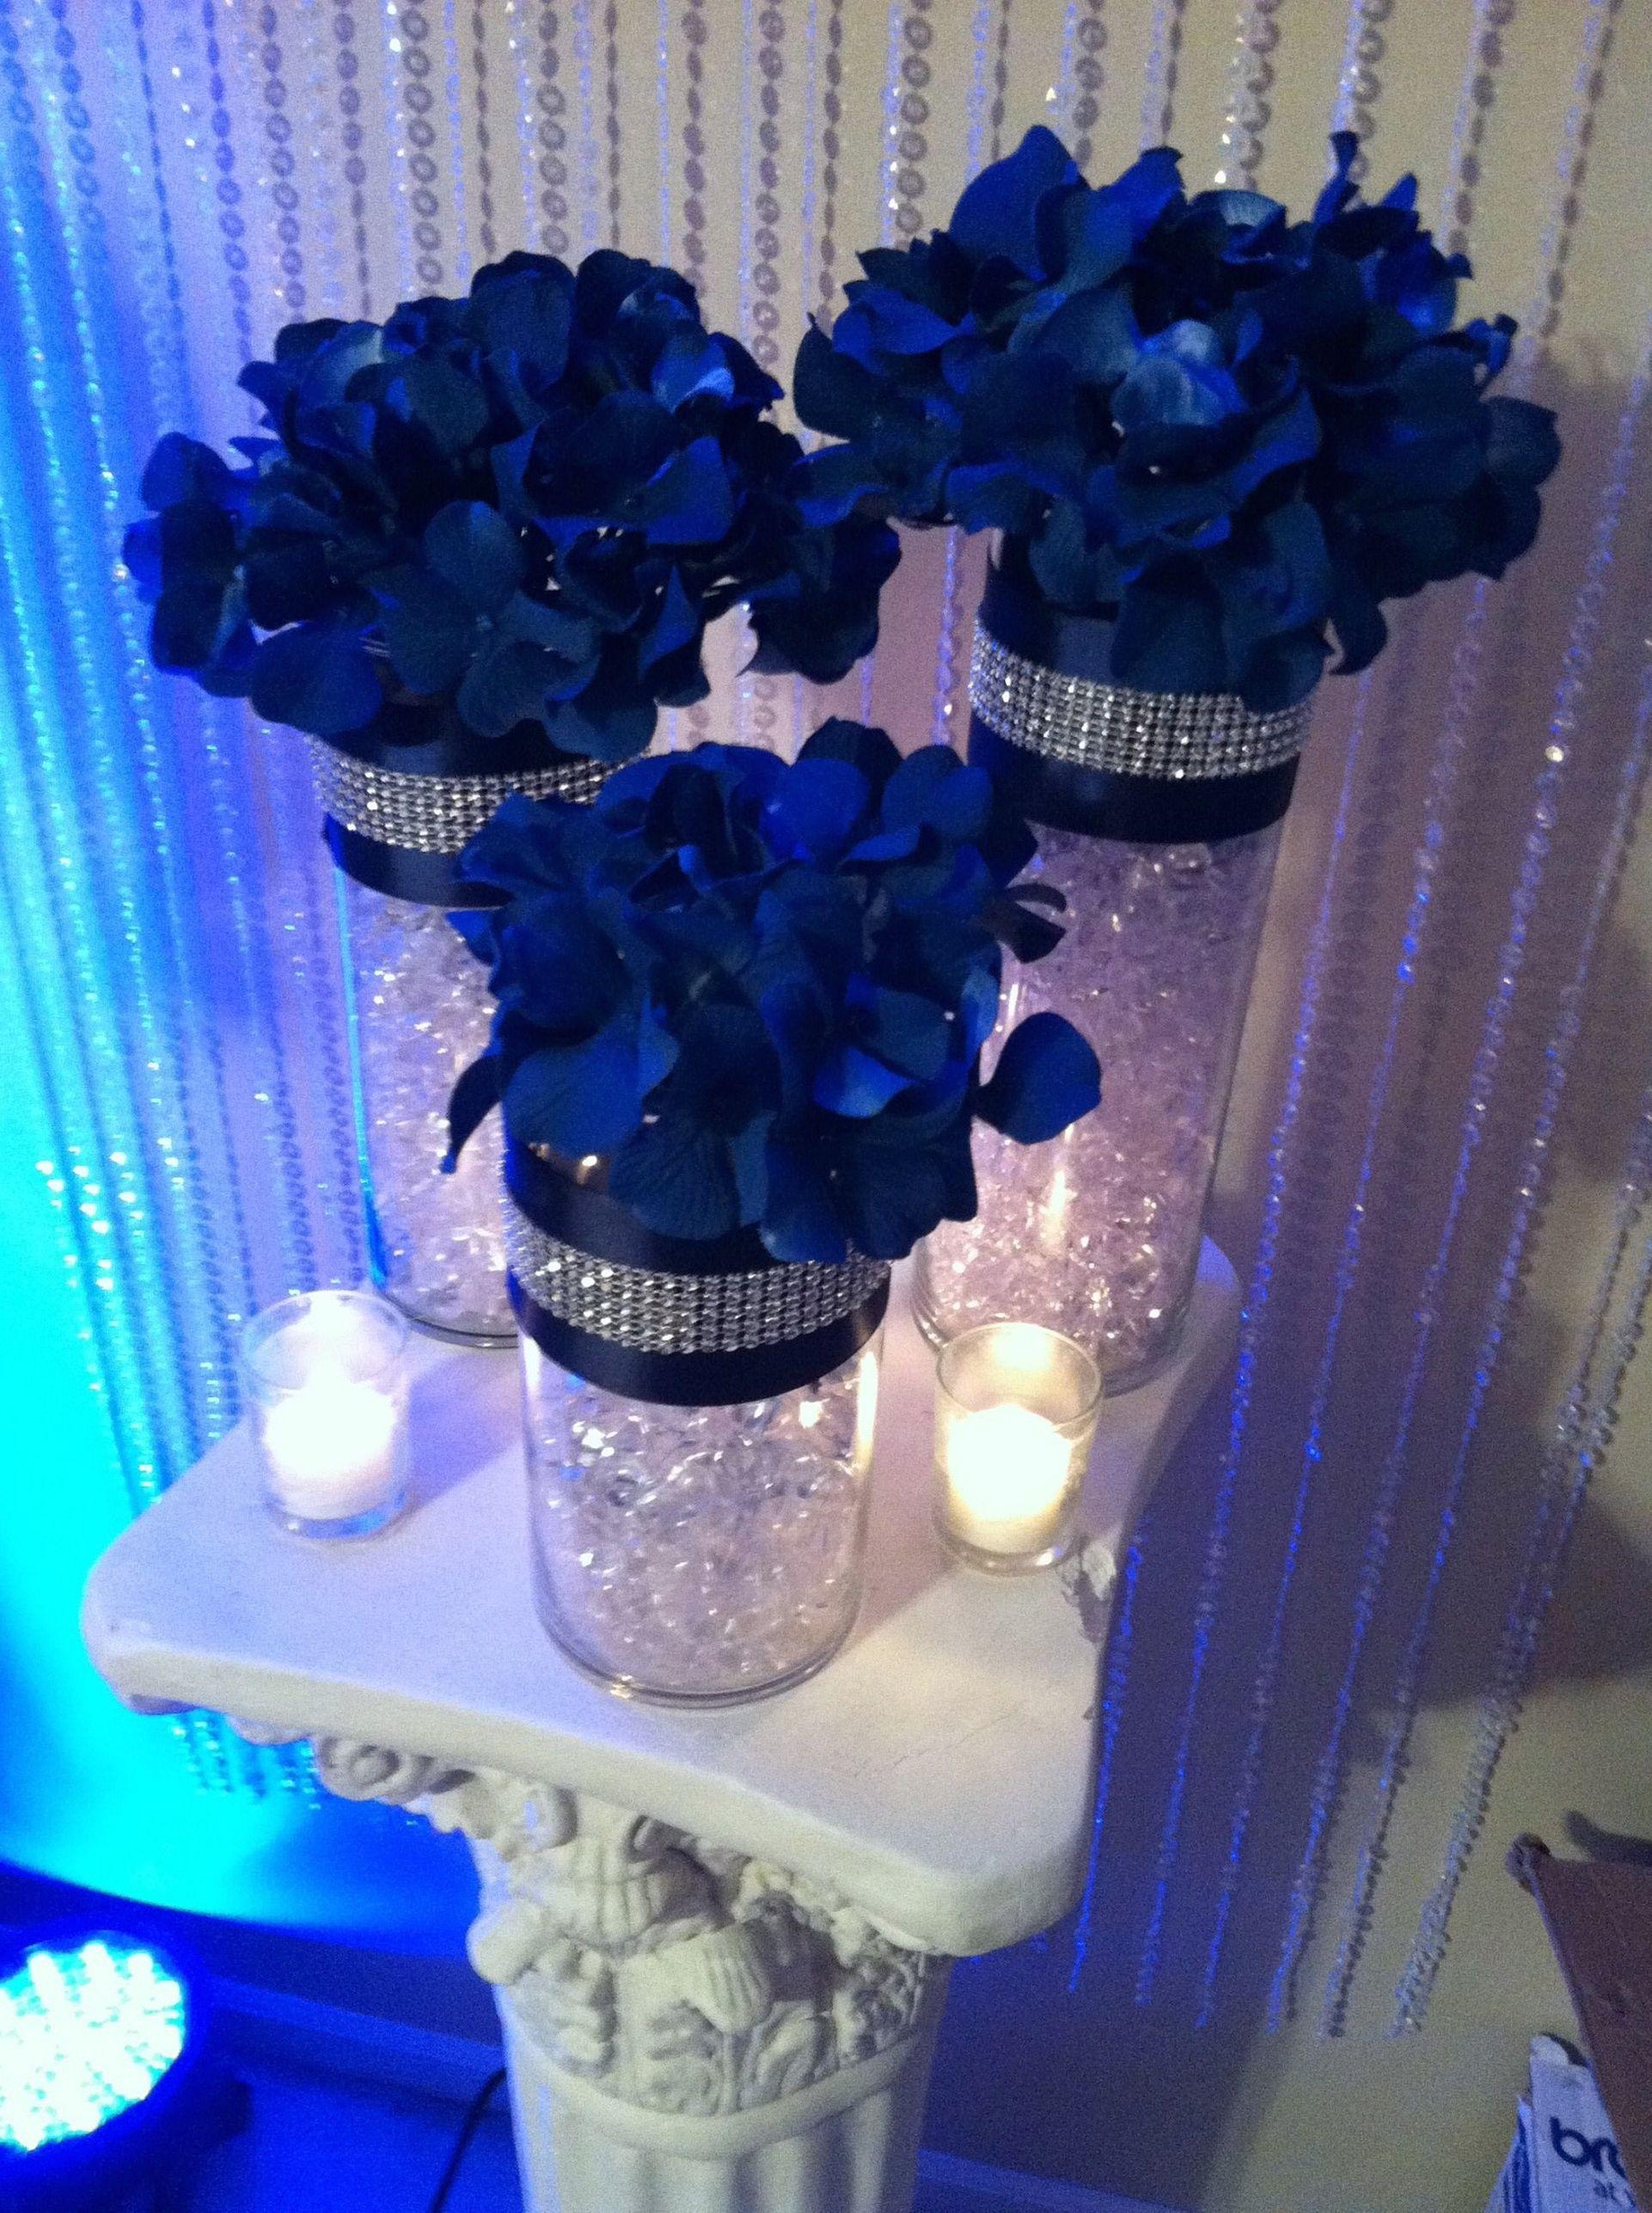 Best 100+ Quince Decorations Ideas for Your Party //bridalore.com/2017/07/02/best-100-quince-decorations-ideas -for-your-party/ & Best 100+ Quince Decorations Ideas for Your Party https://bridalore ...